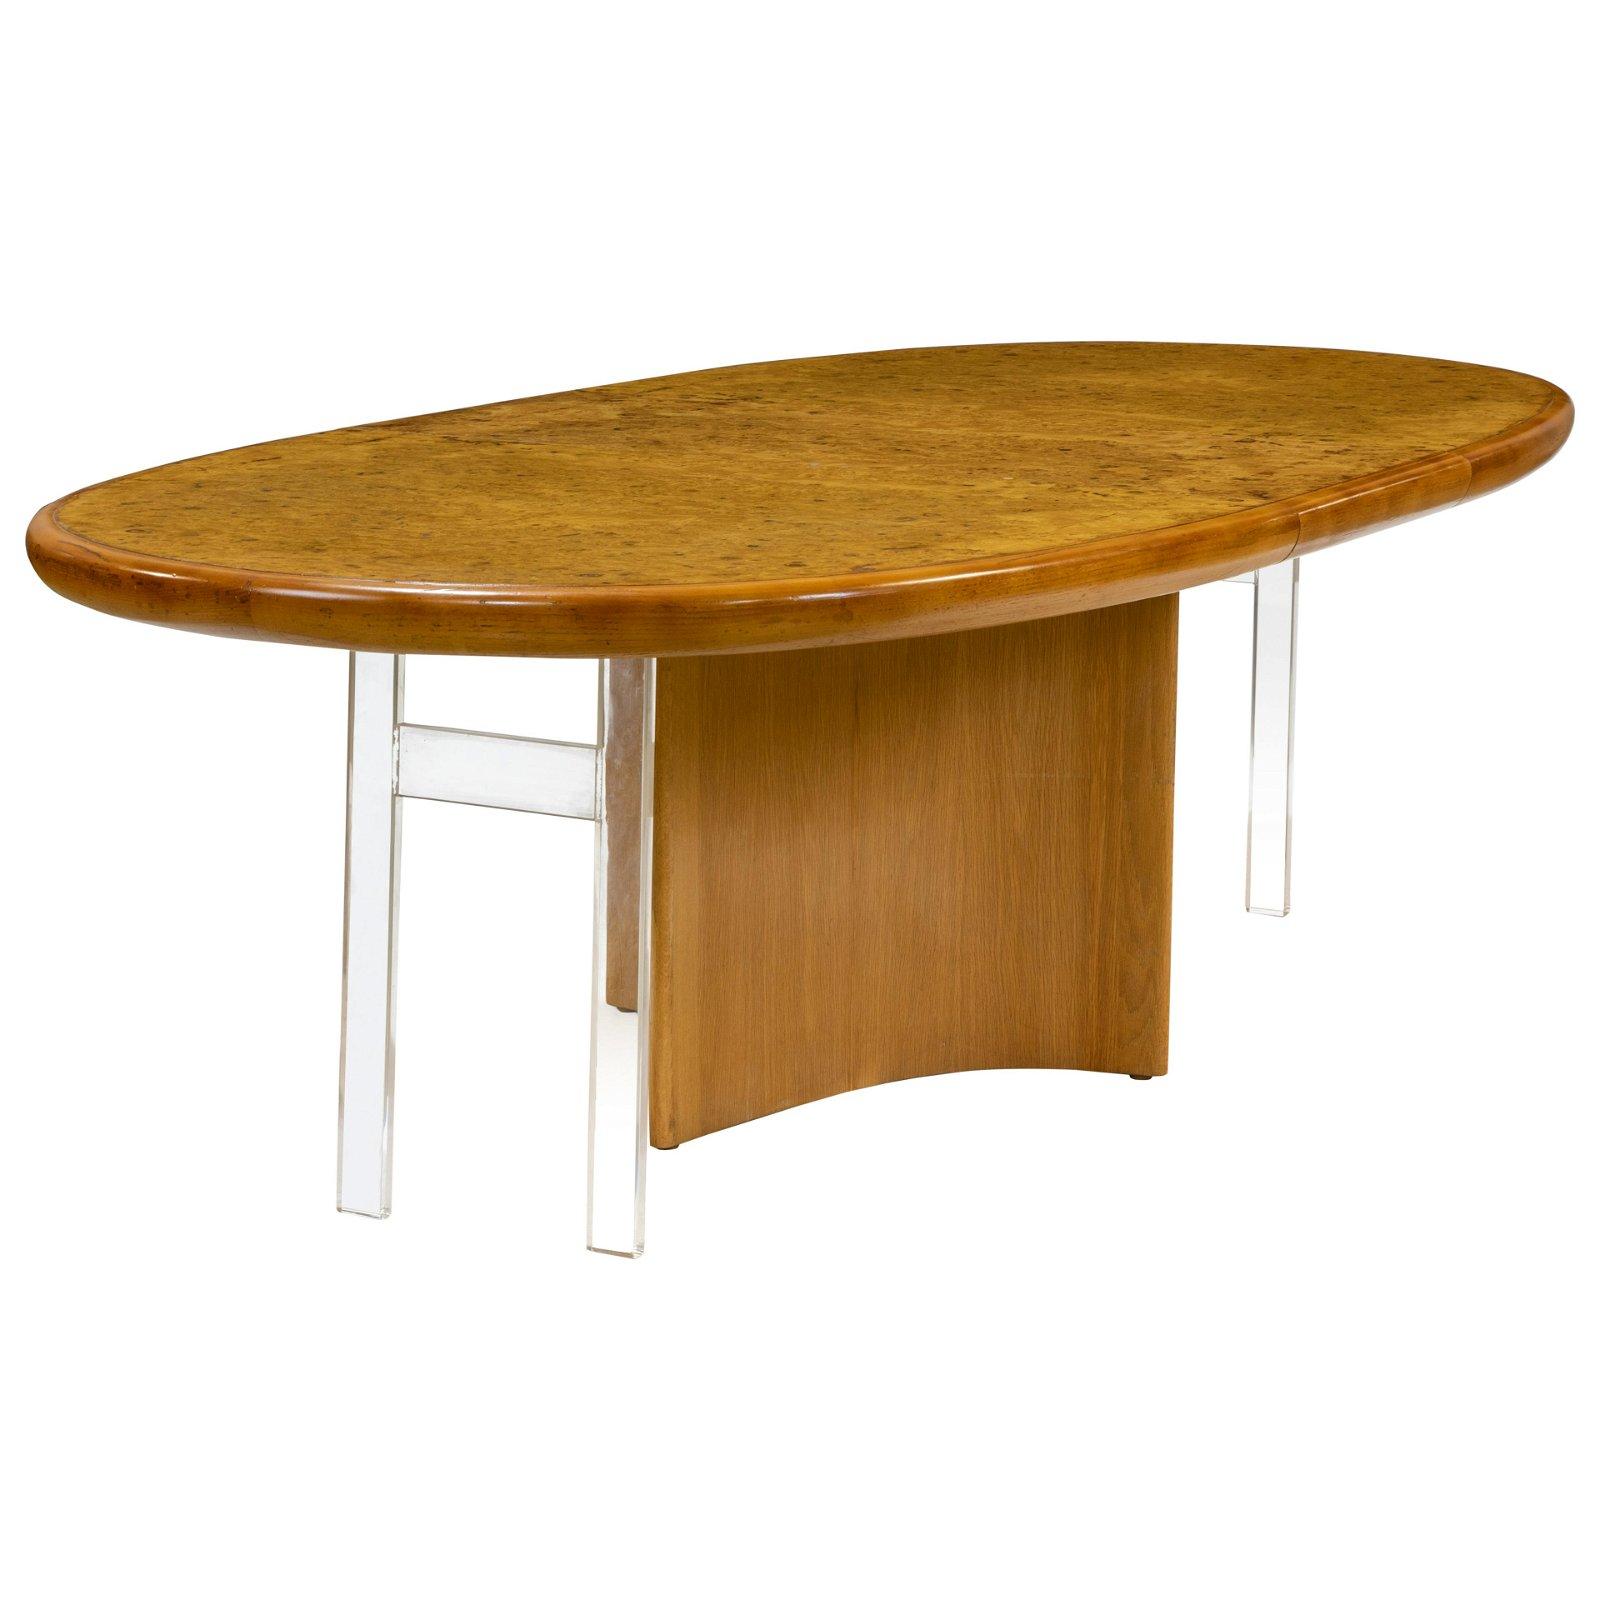 Vladimir Kagan - Intaglio Burl Dining Table